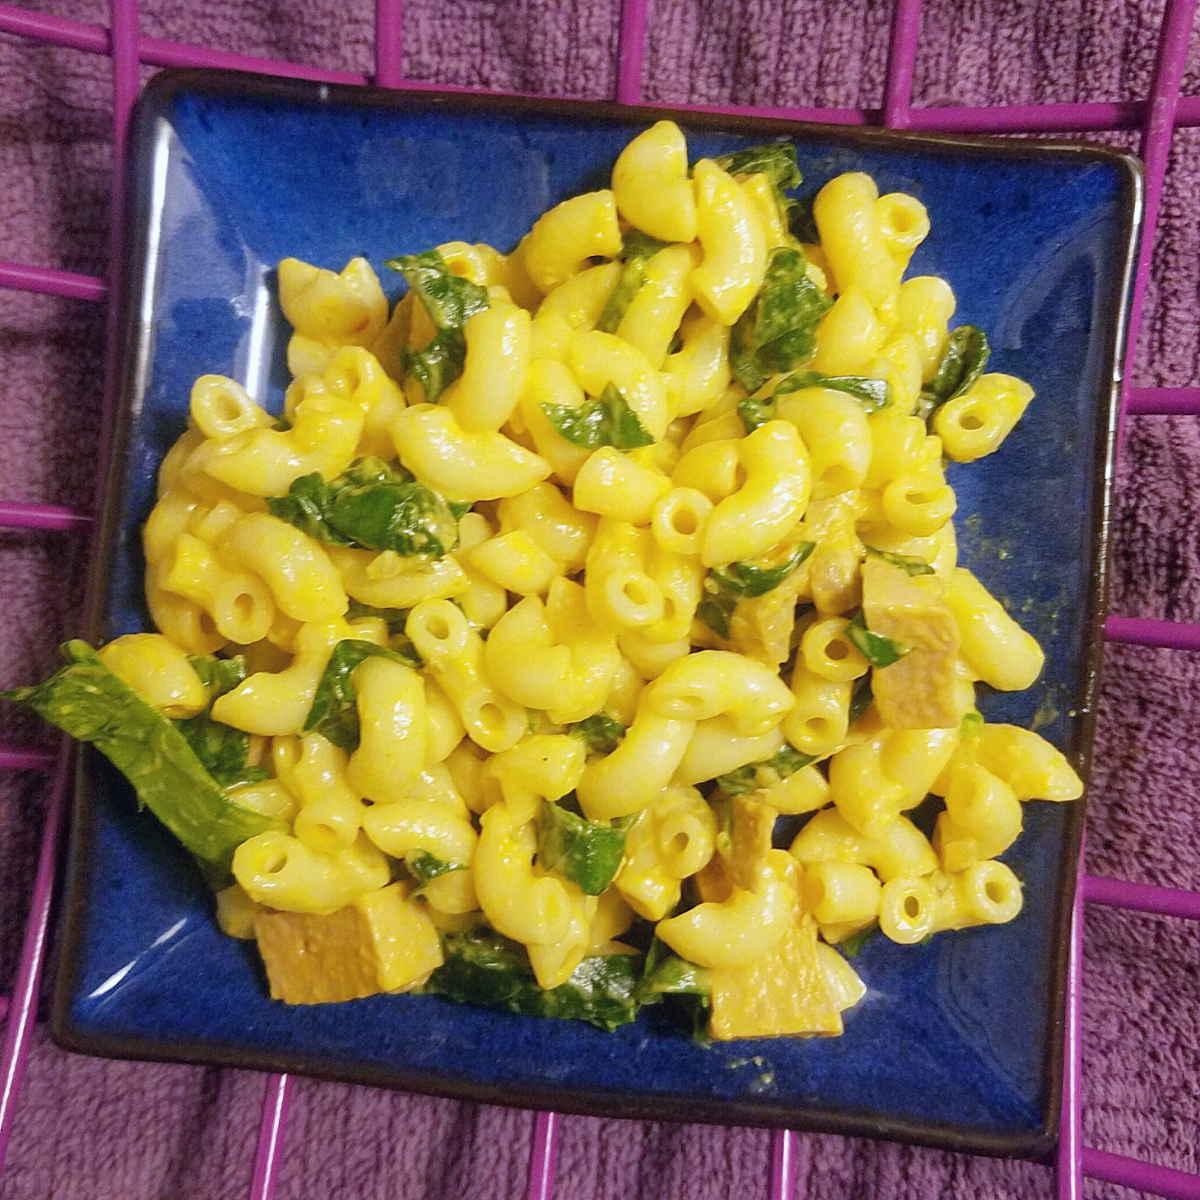 Creamy spinach and turmeric pasta salad: vegan & gluten-free